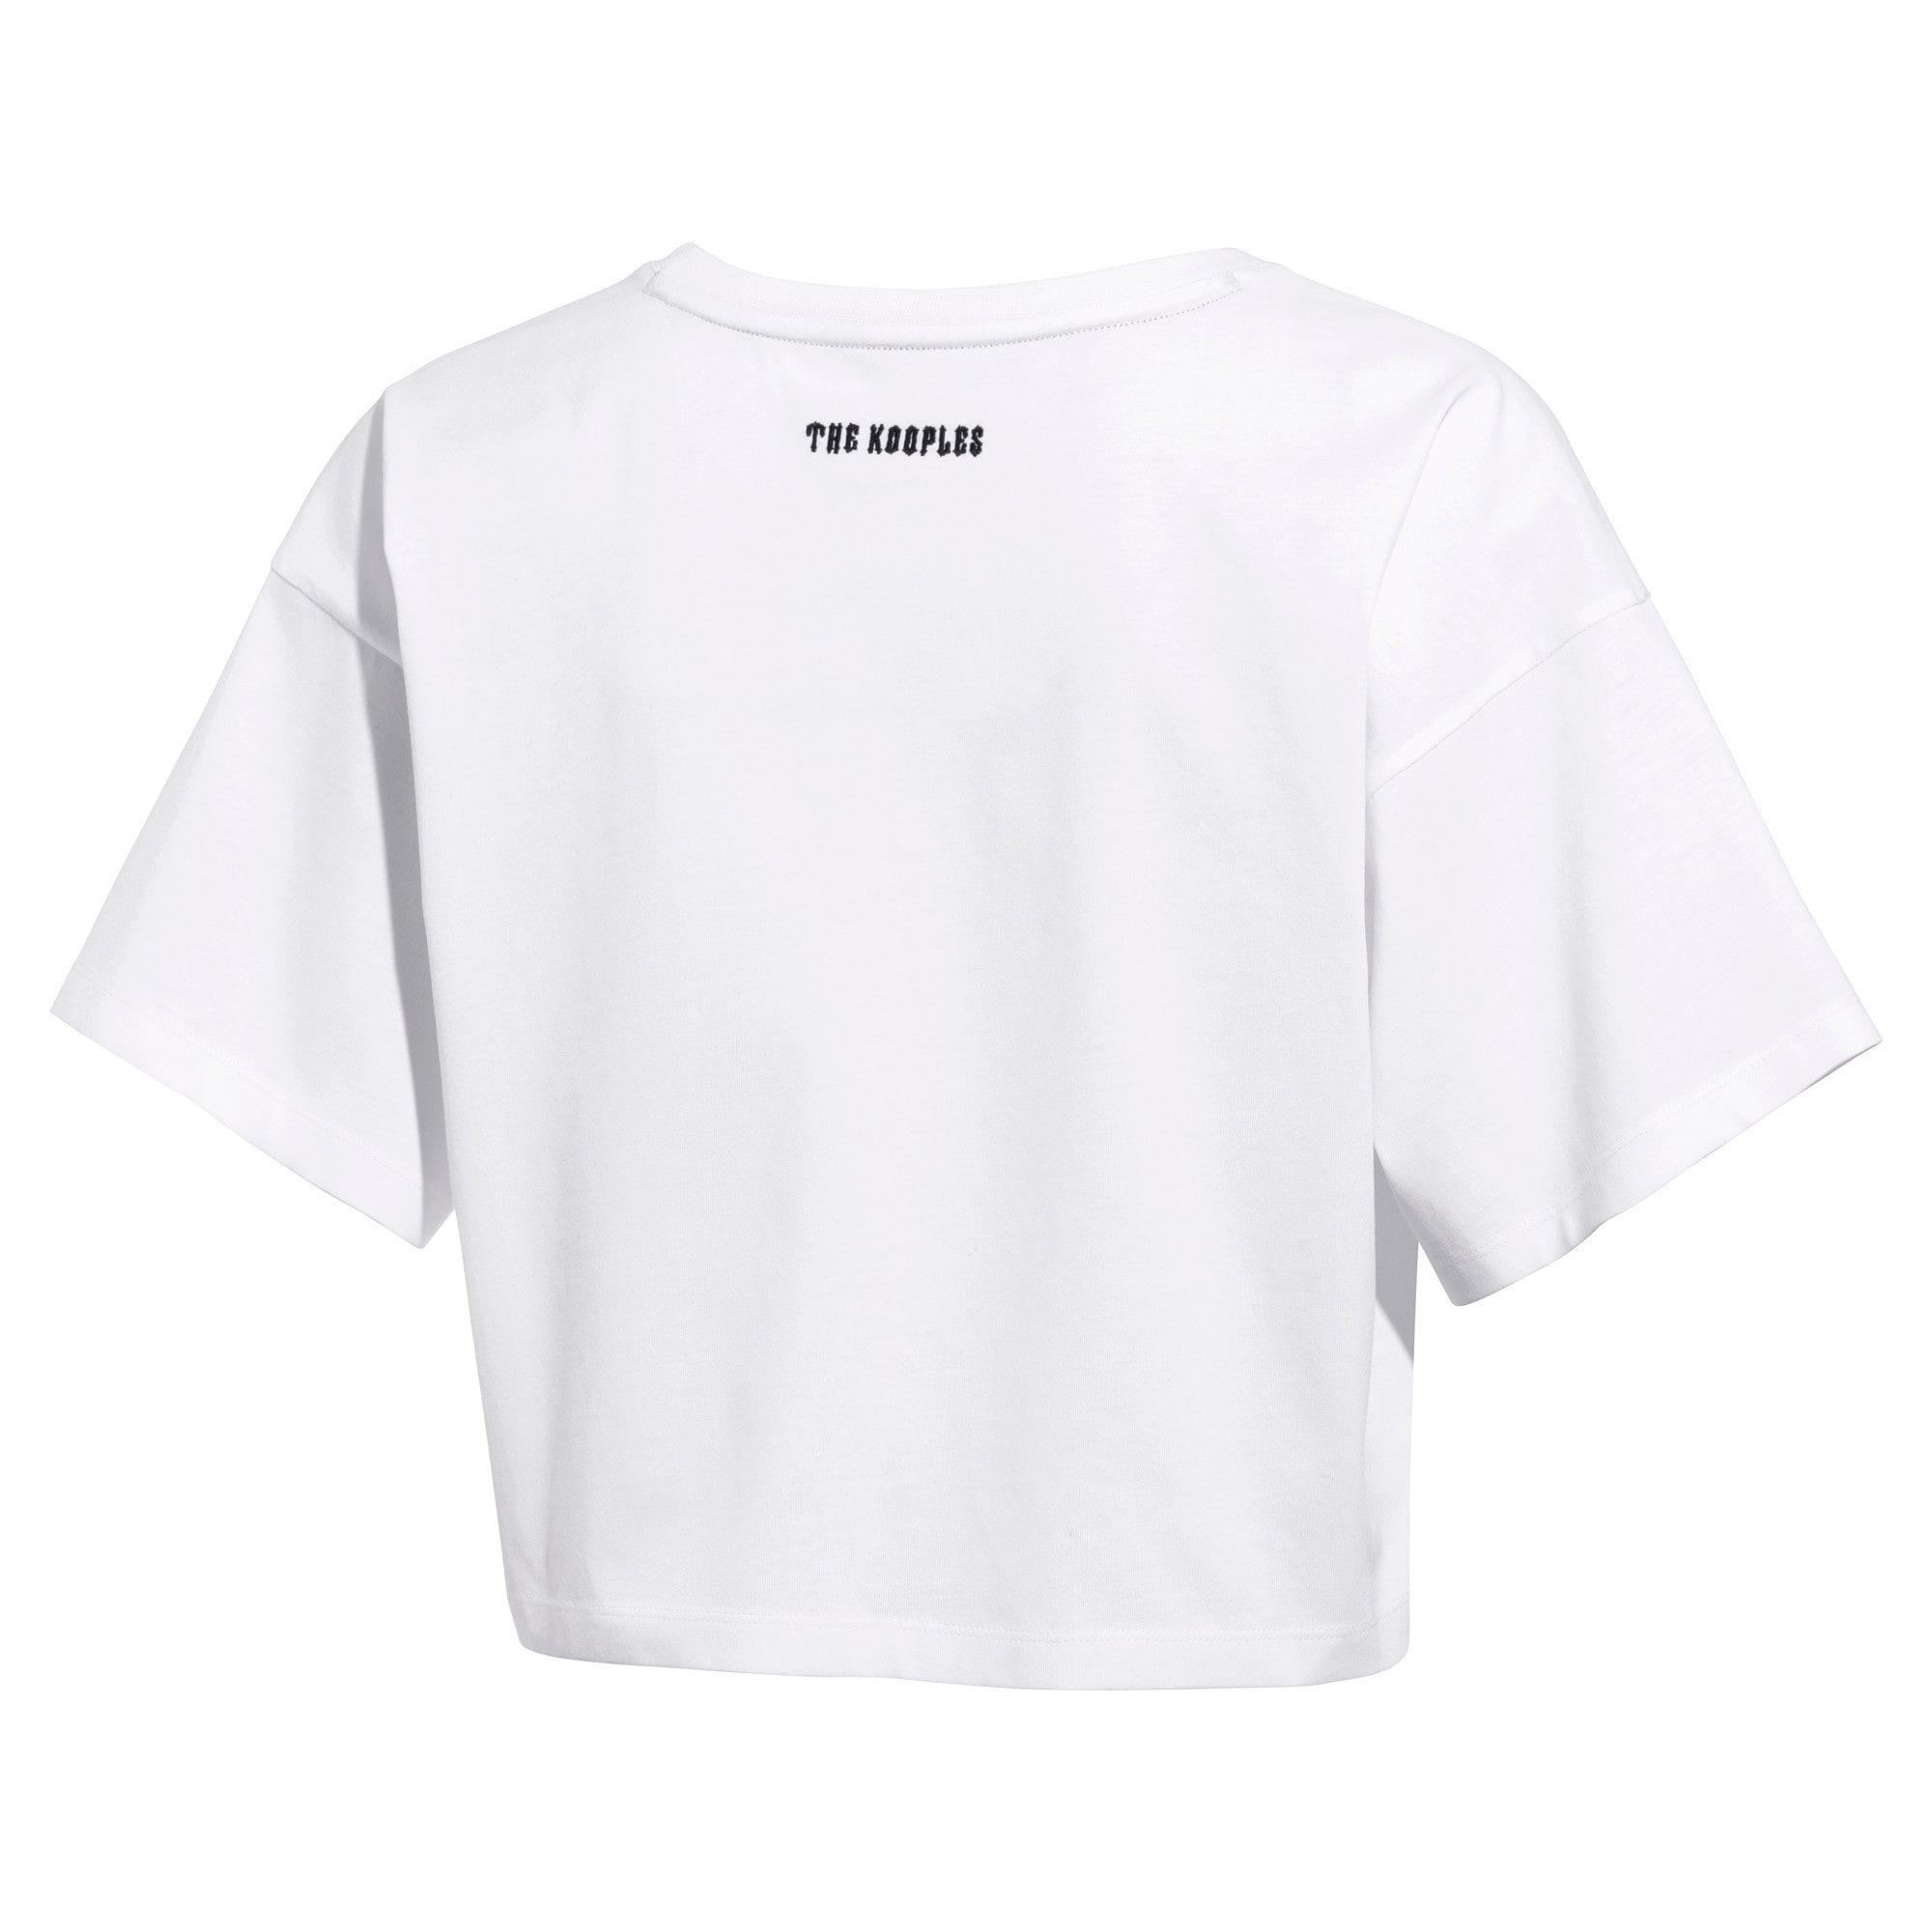 Miniatura 2 de Camiseta PUMA x THE KOOPLES para mujer, Puma White, mediano